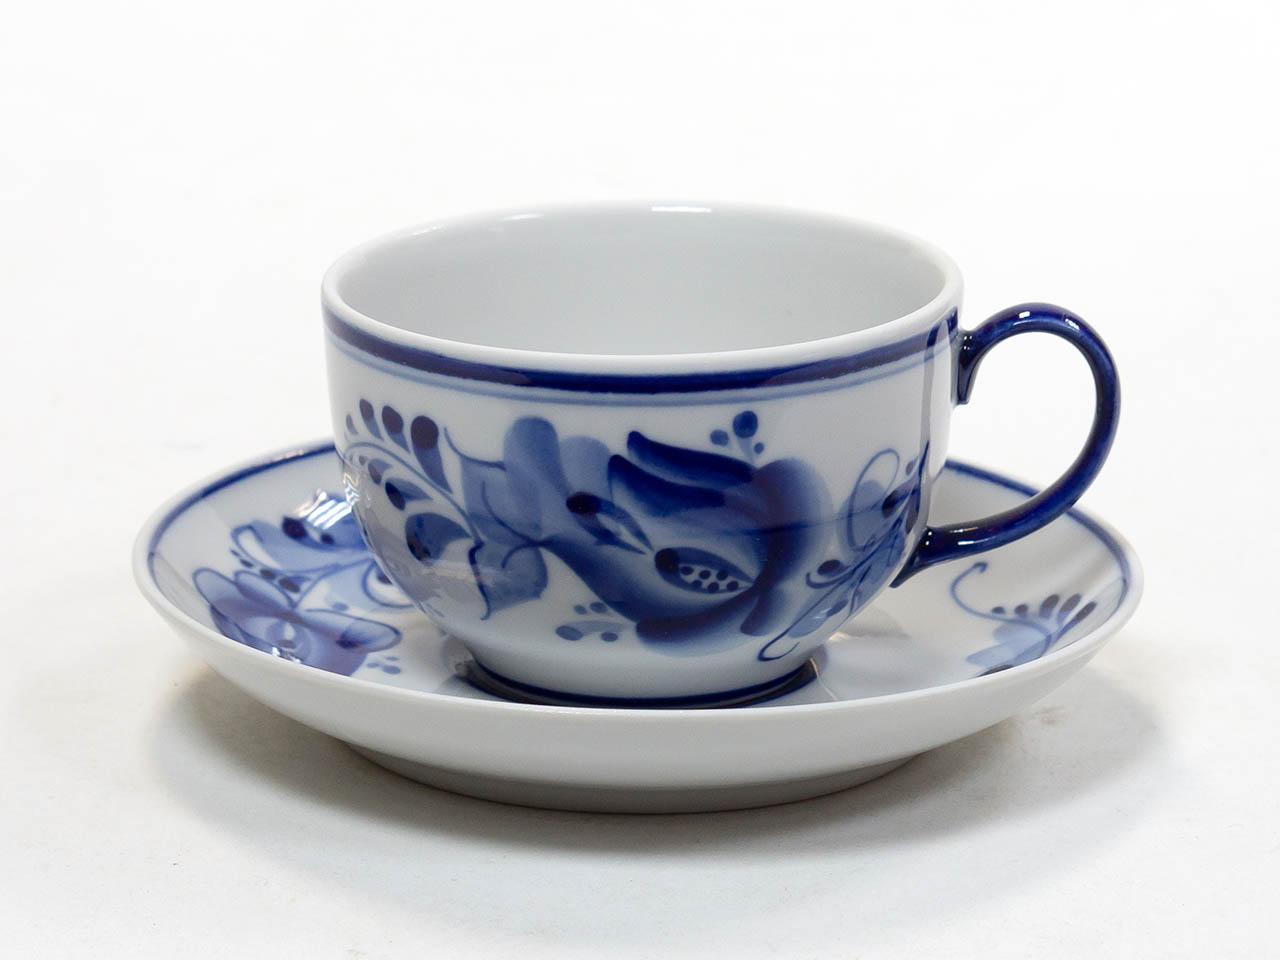 Фото Чашка чайная с блюдцем Гжель 190 мл Янтарь Тюльпан